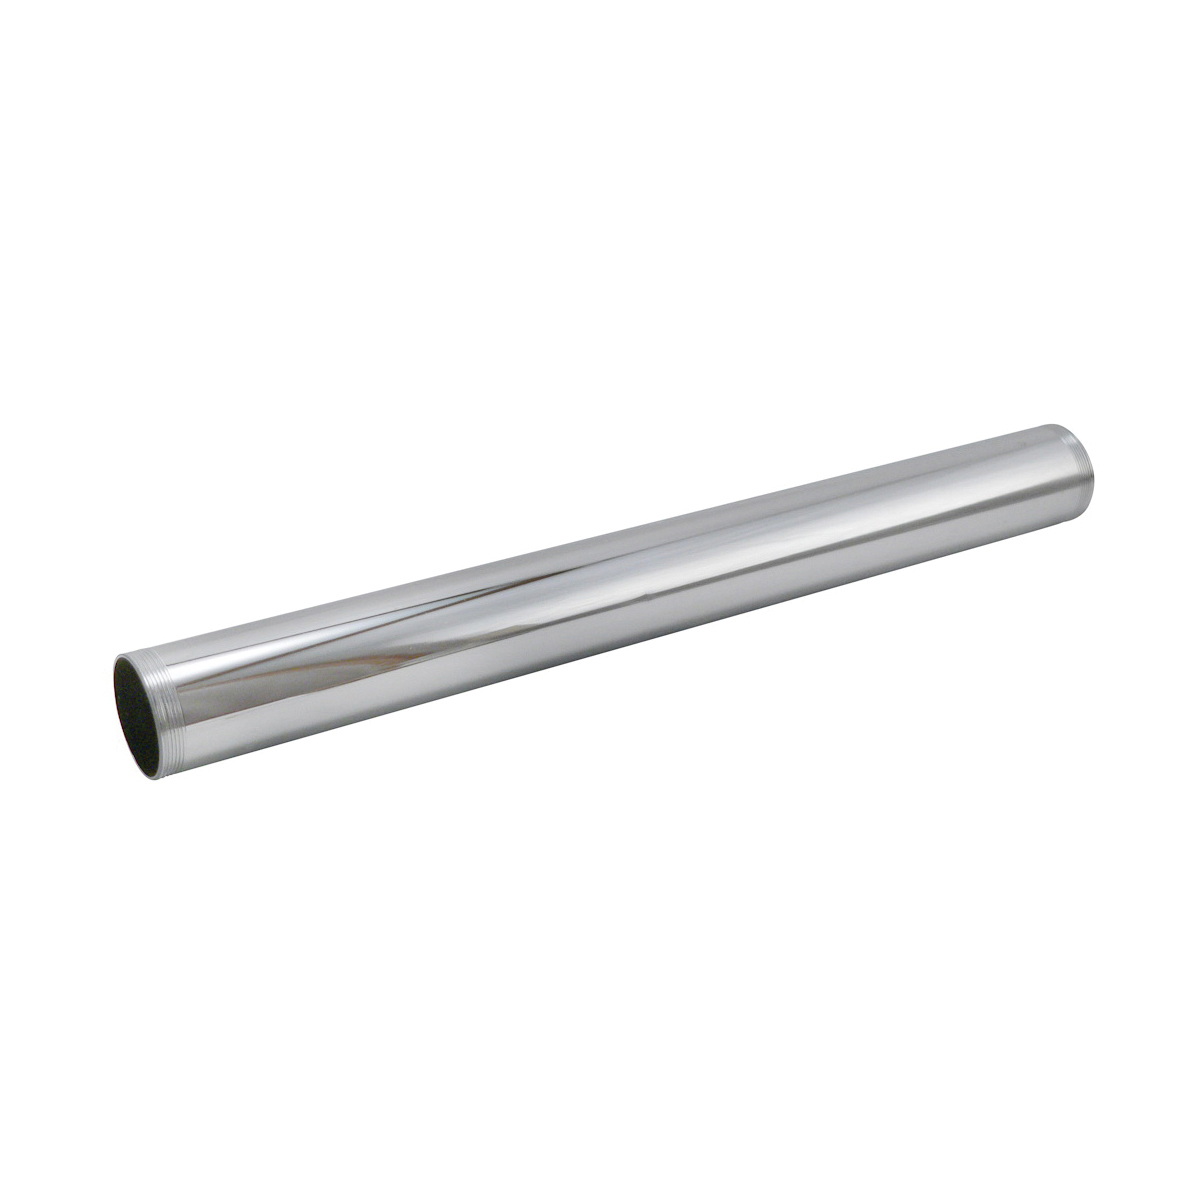 Keeney 1773PC TBE Tube, 1-1/4 in ID x 12 in L, 17 ga Brass, Polished Chrome, Import